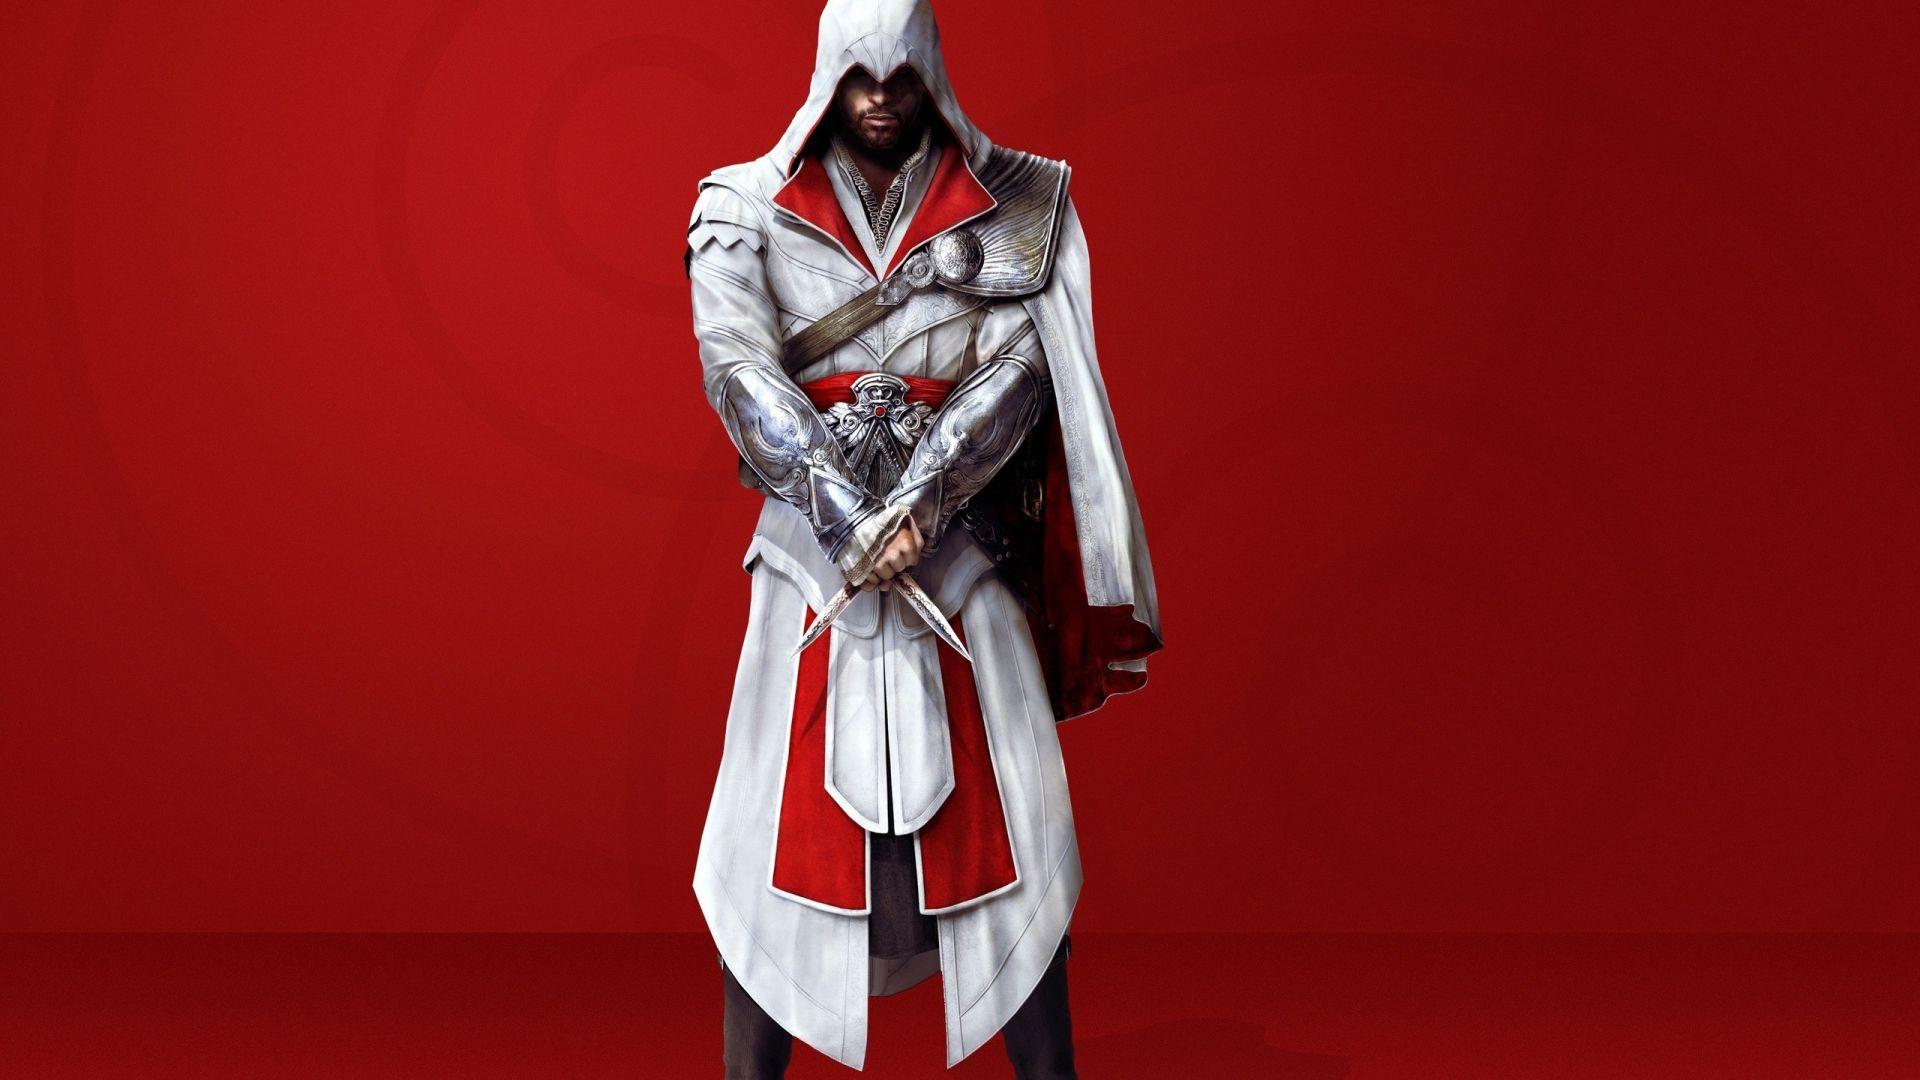 Assassins Creed Brotherhood Ezio Auditore